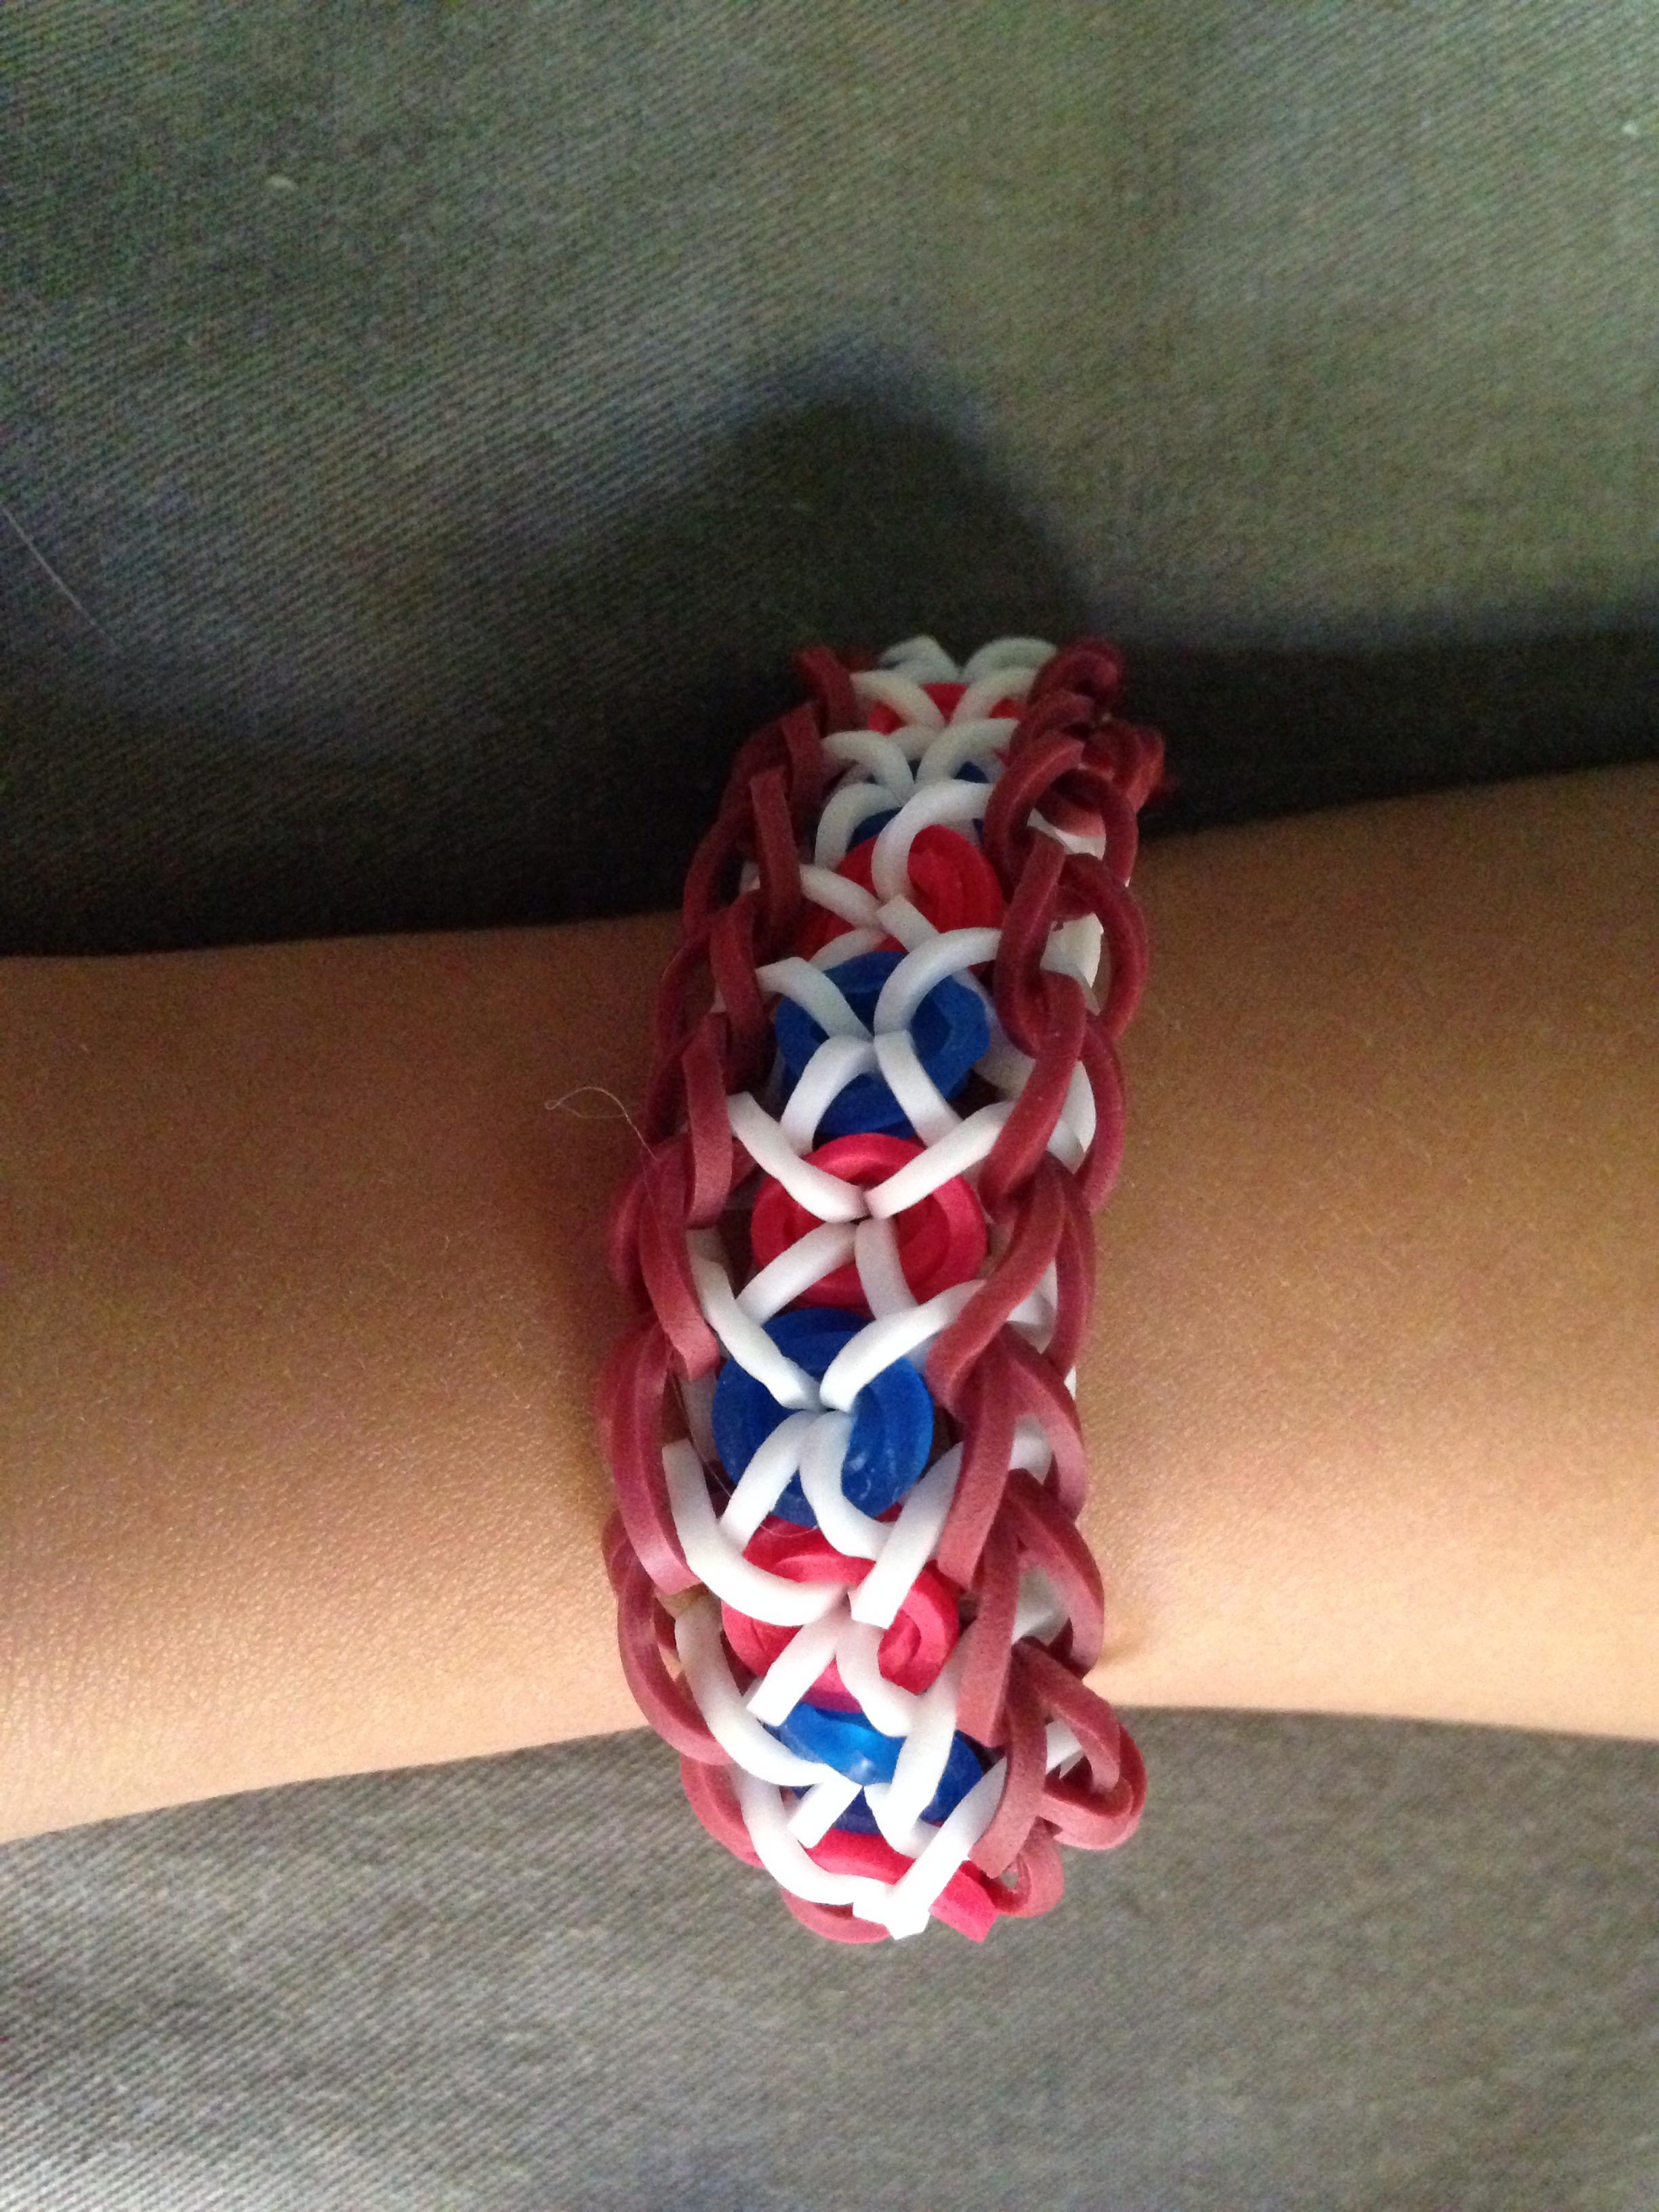 Confetti Criss-Cross Bracelet